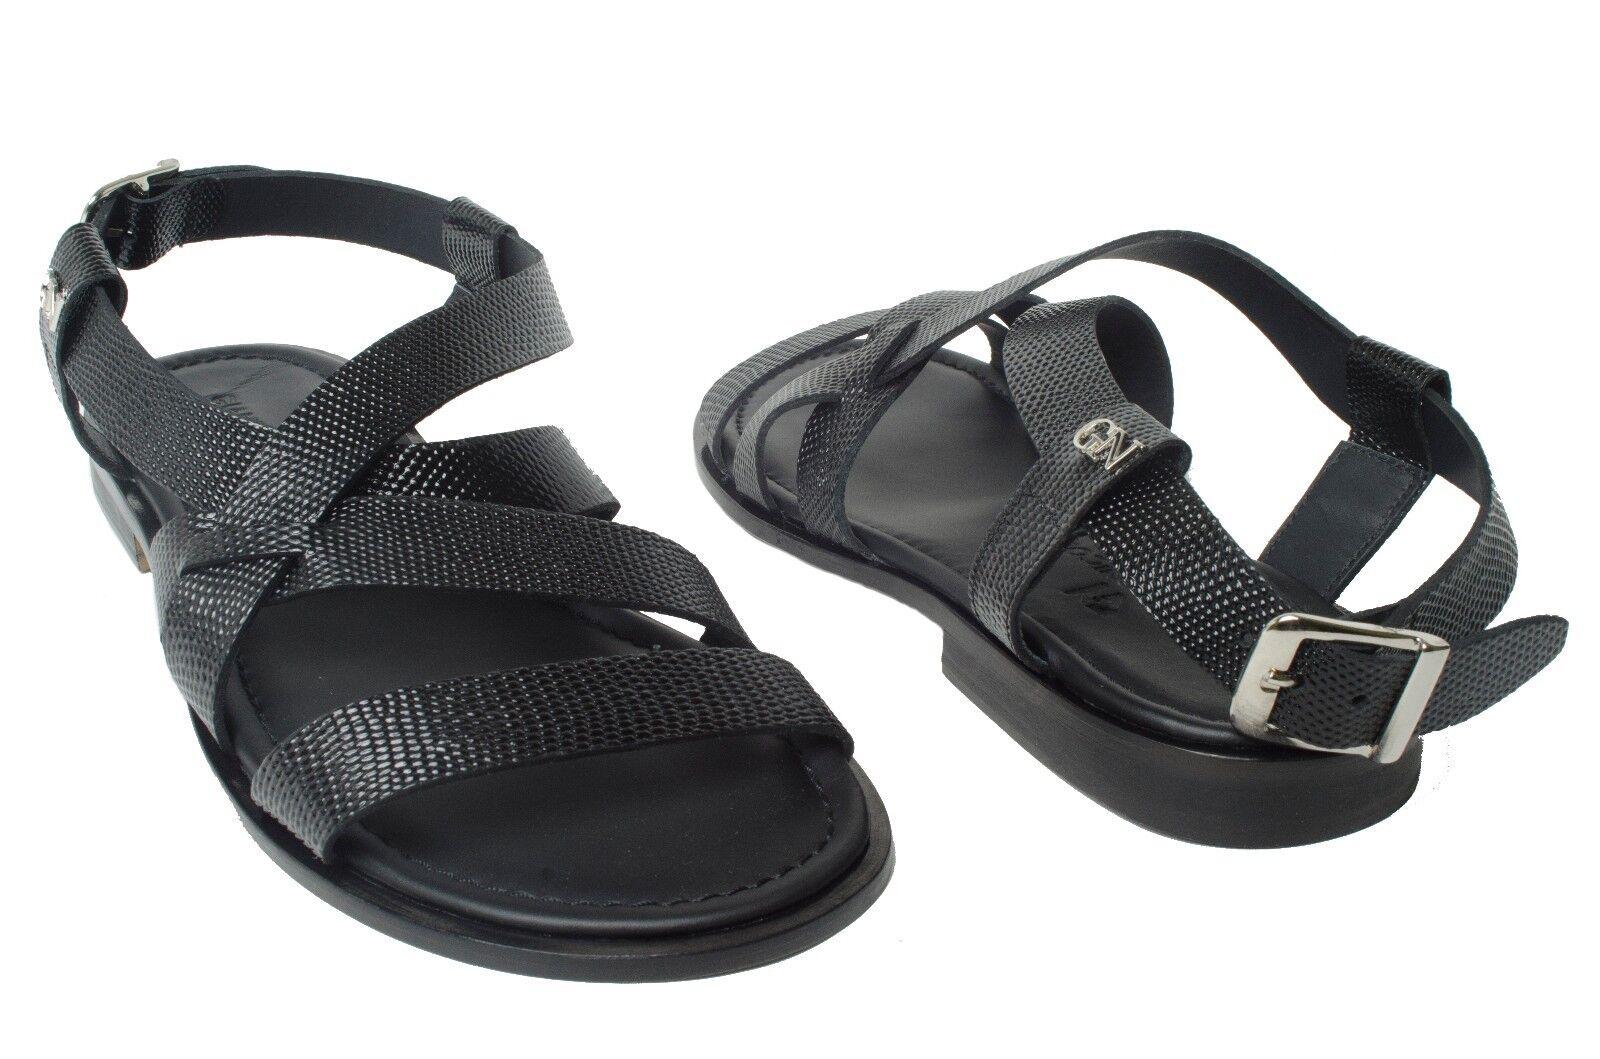 GIAMPIERONICOLA 3720 3720 3720 Italian schwarz lizard printed leather sandals w back strap cd743e